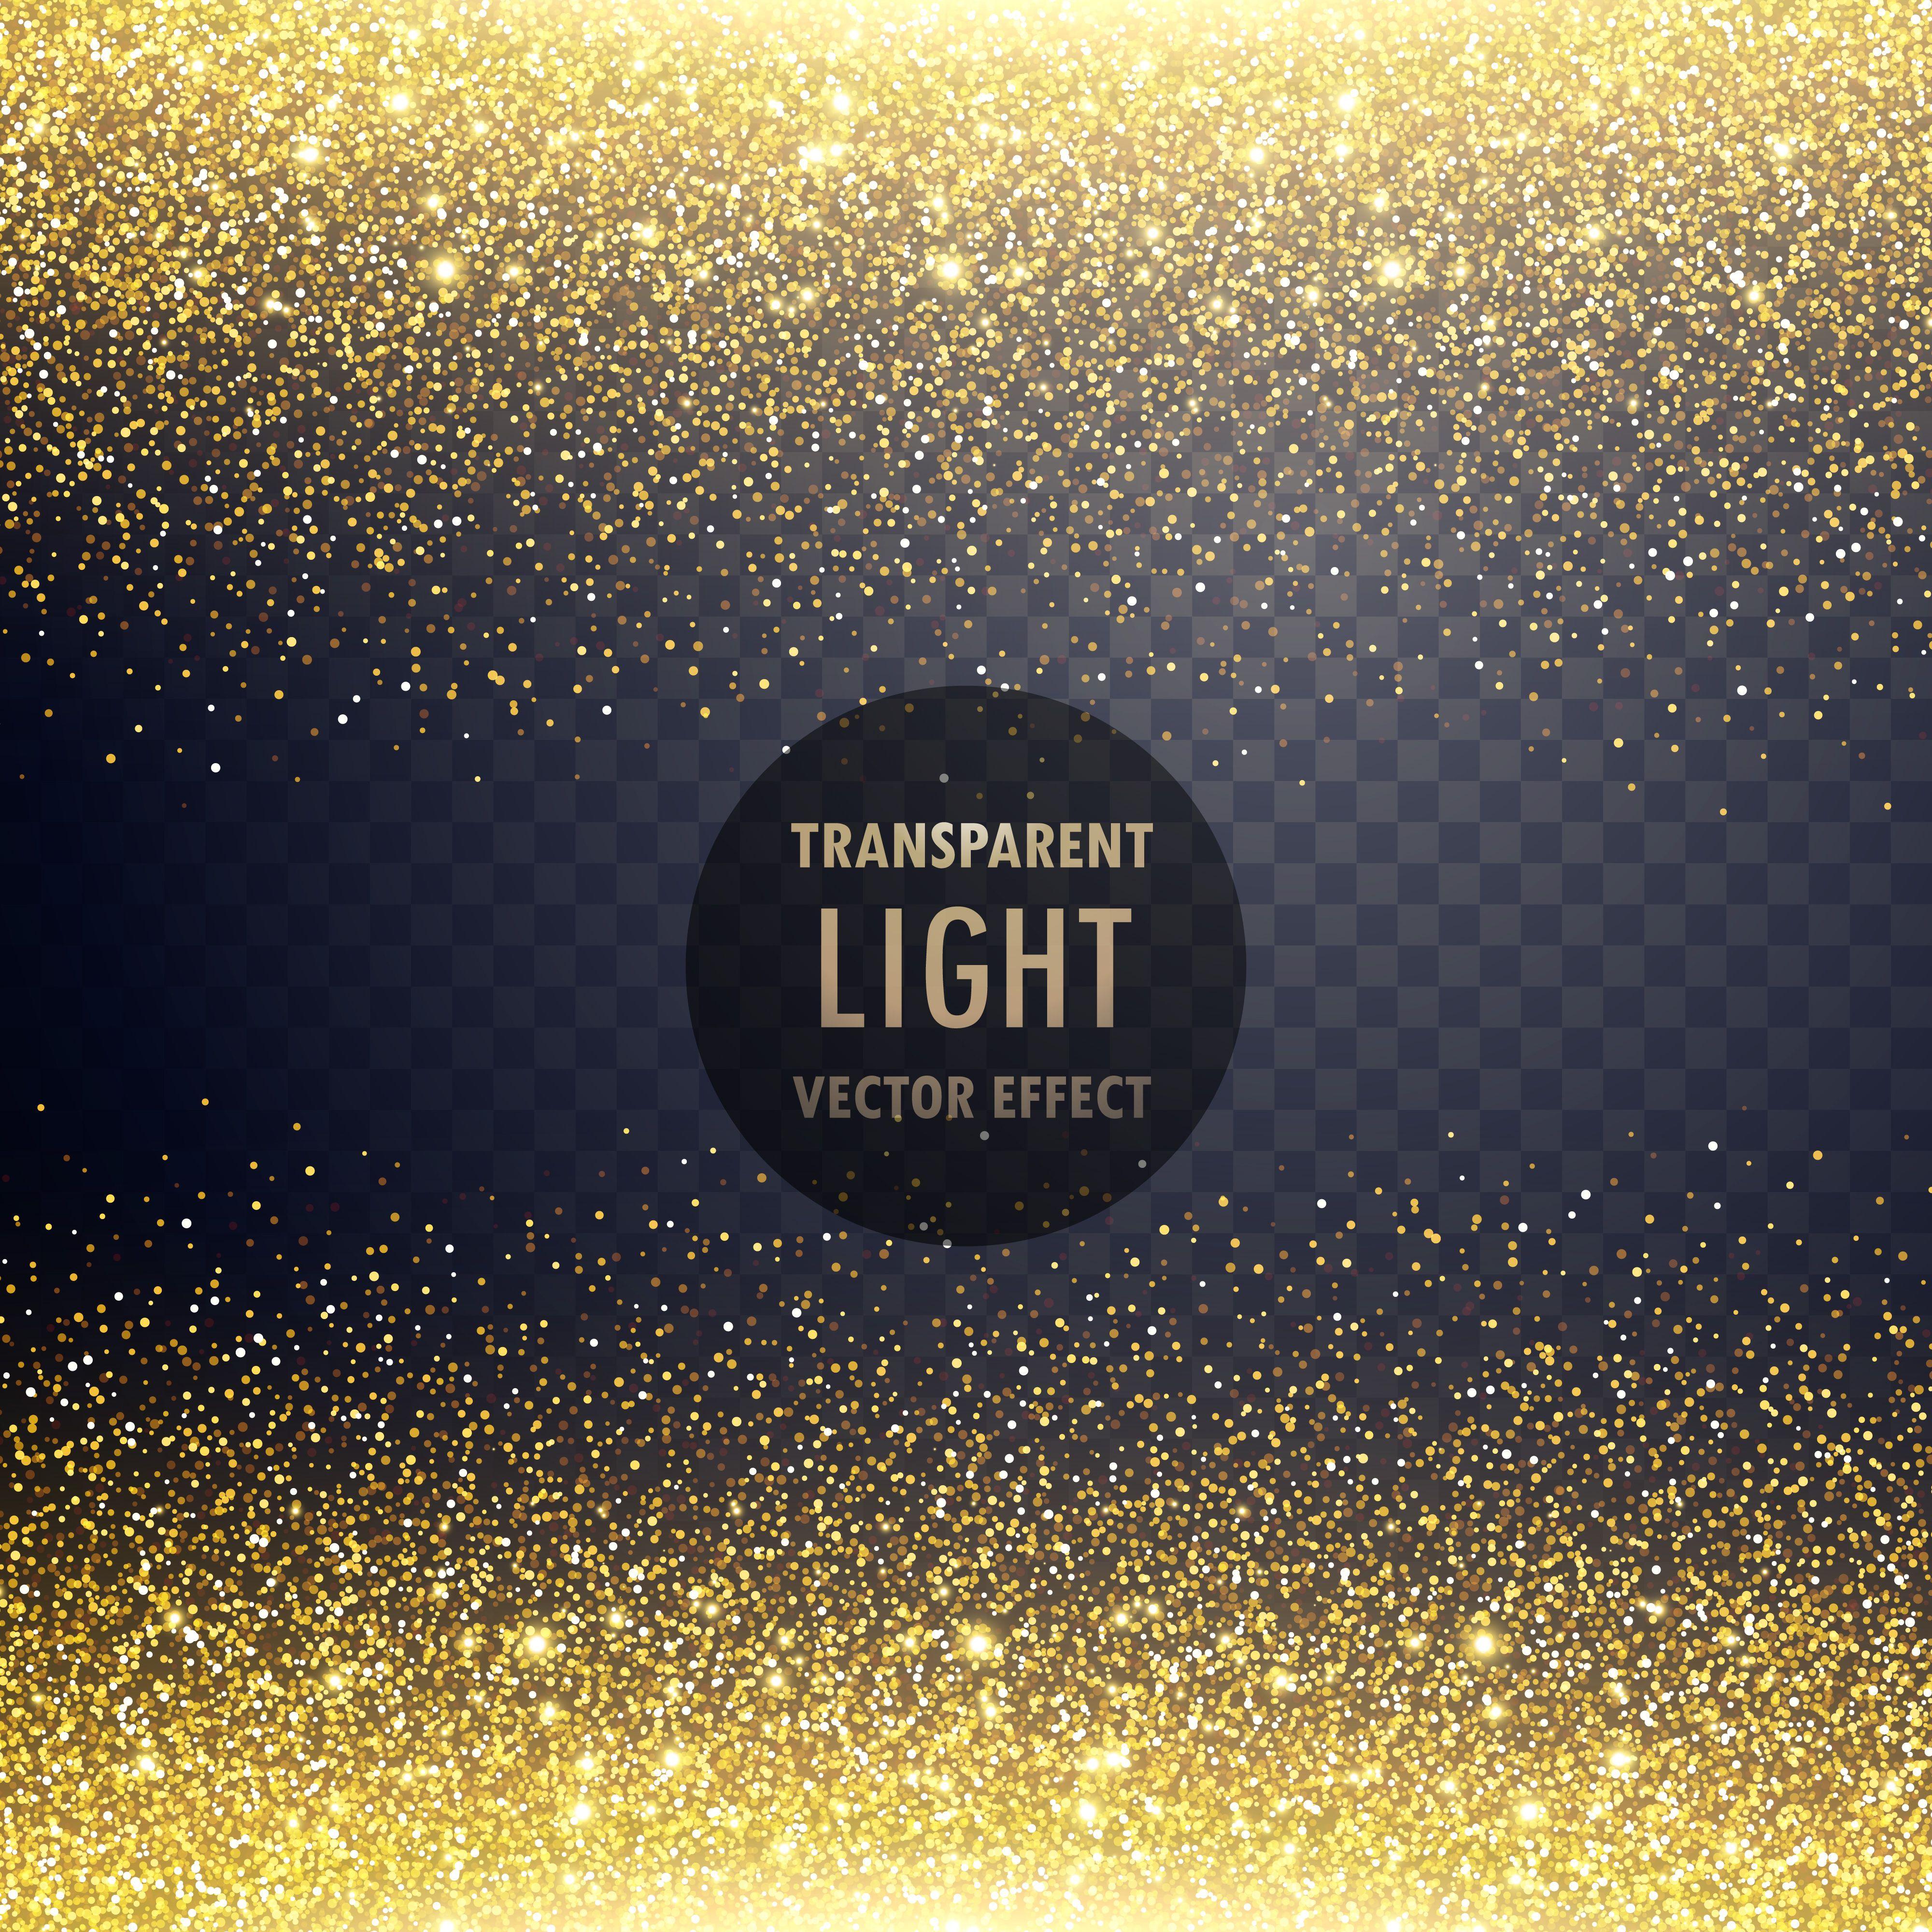 Transparent Golden Glitter Light Effect Background Vector Choose From Thousands Of Free Vectors Clip Art Des Glitter Background Vector Free Vector Art Design